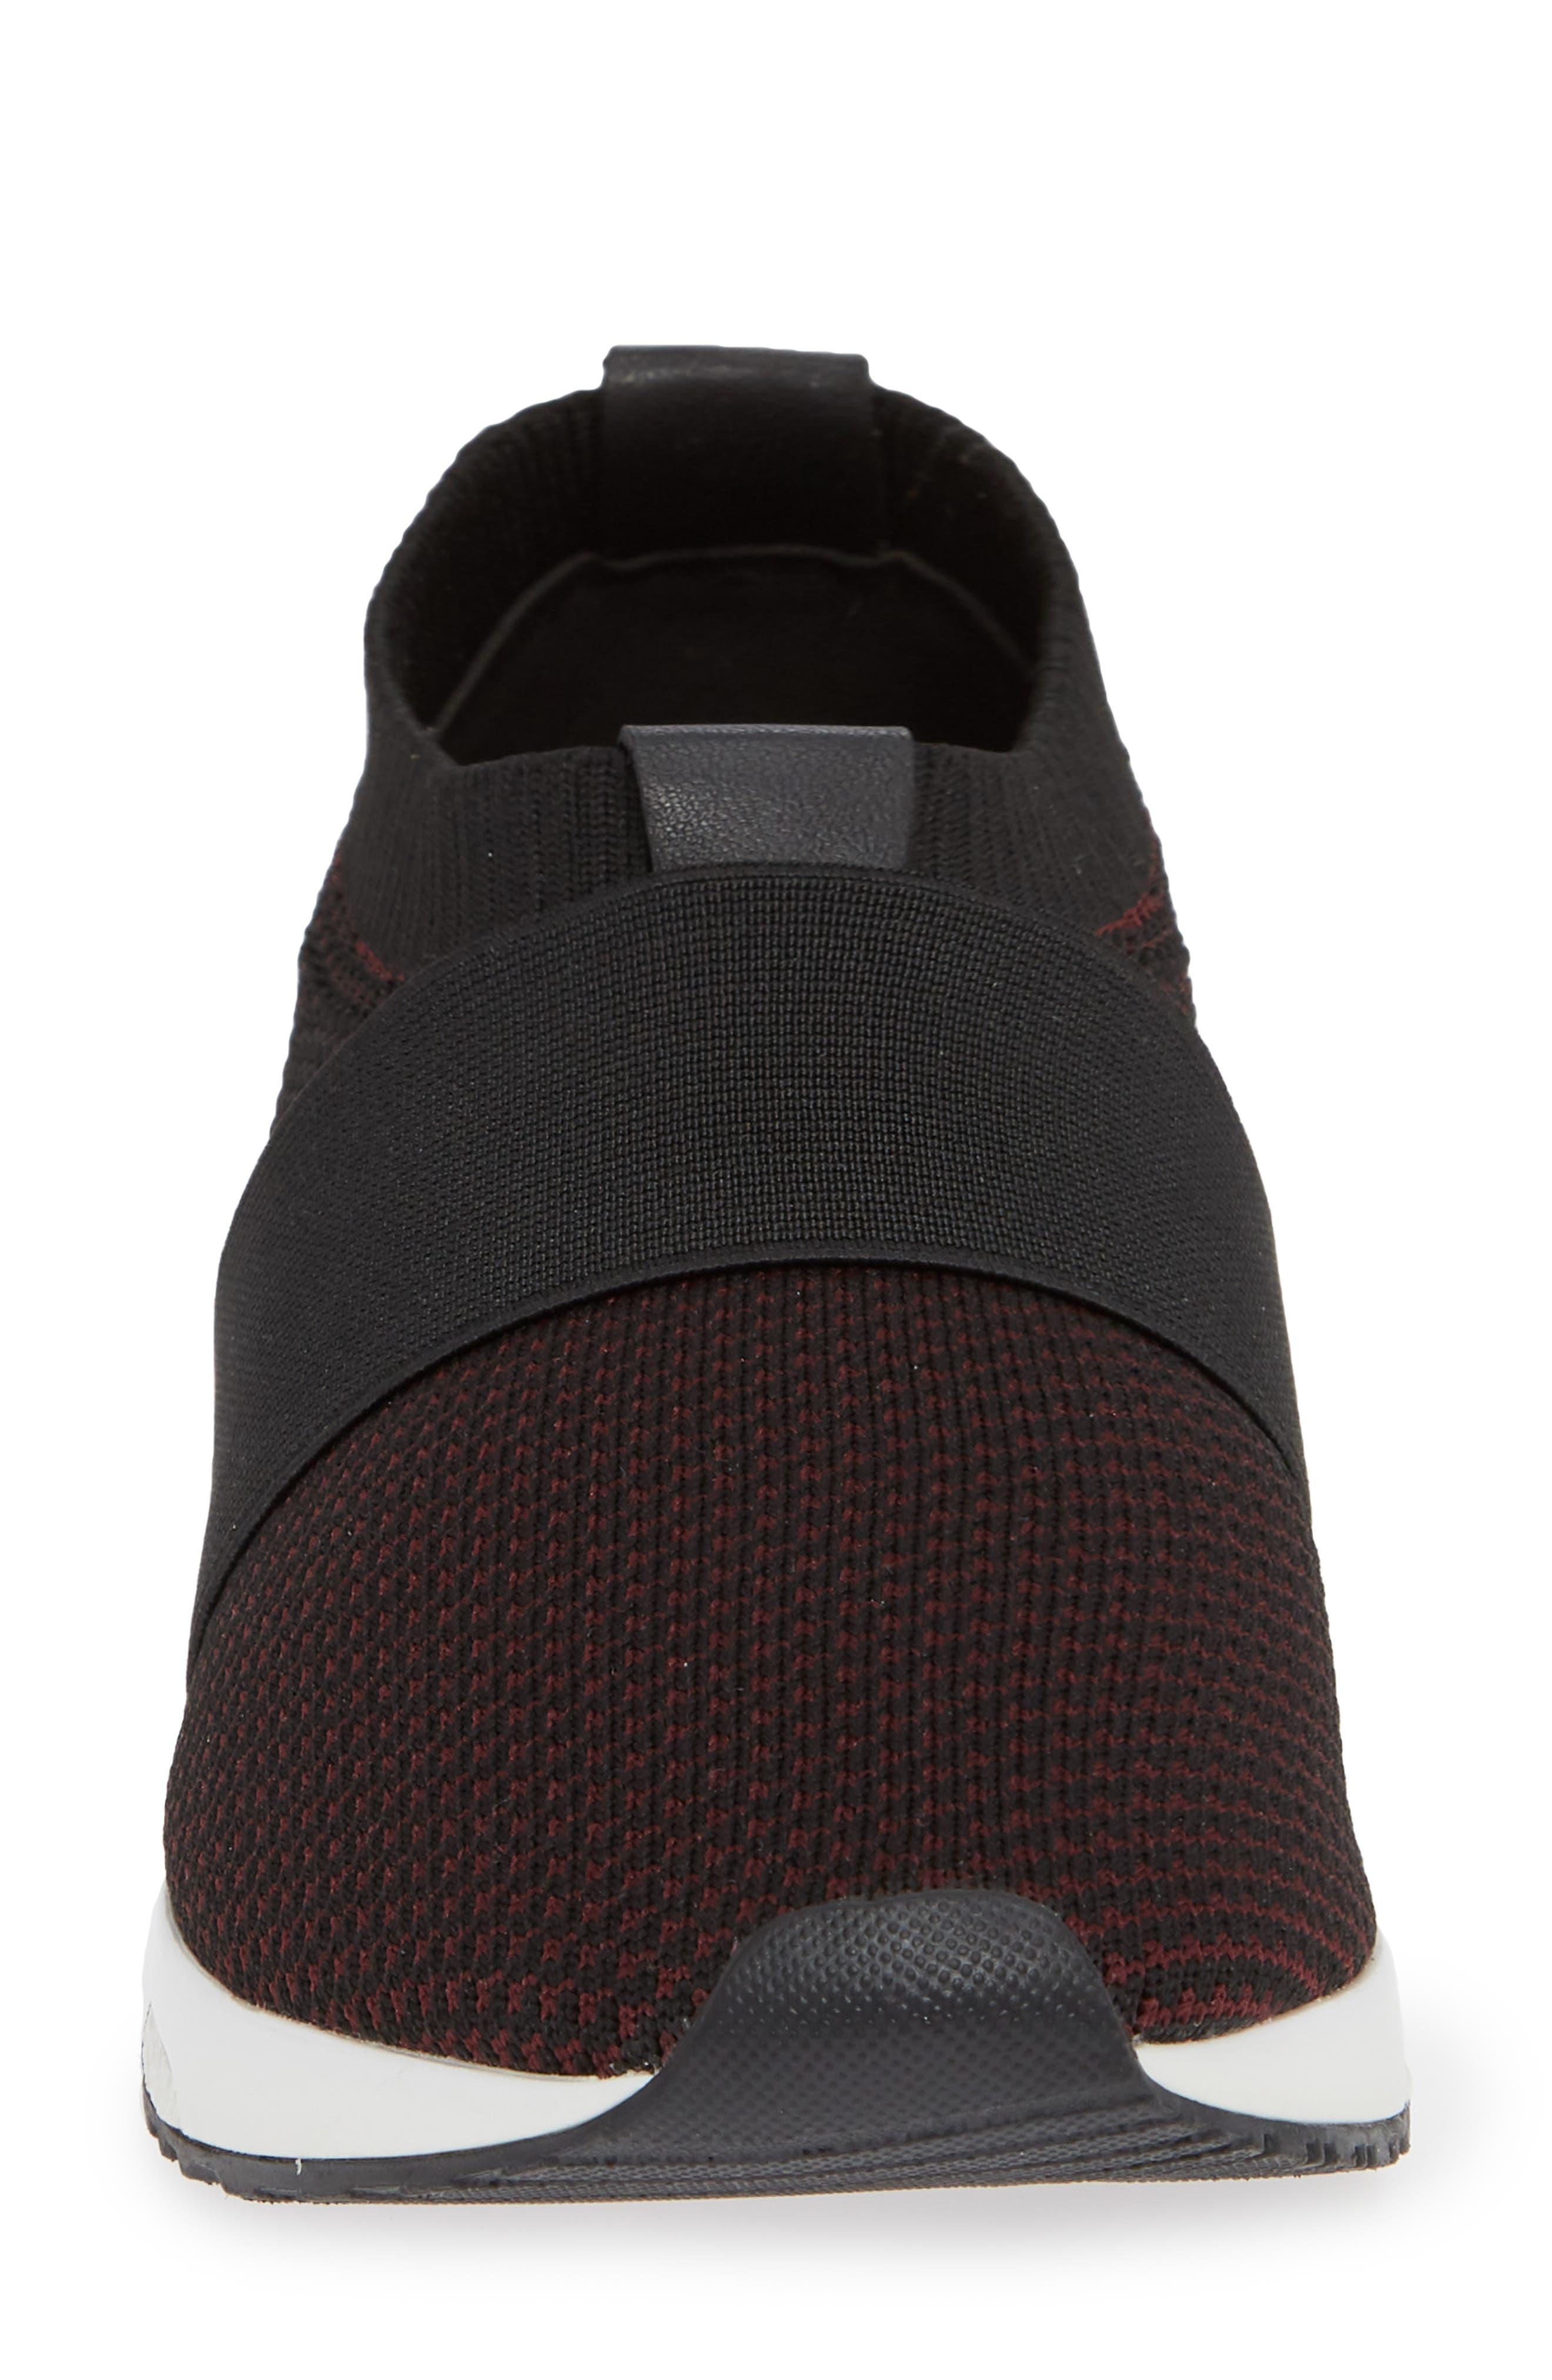 Brooke Slip-On Sneaker,                             Alternate thumbnail 6, color,                             Black/ Wine Knit Fabric